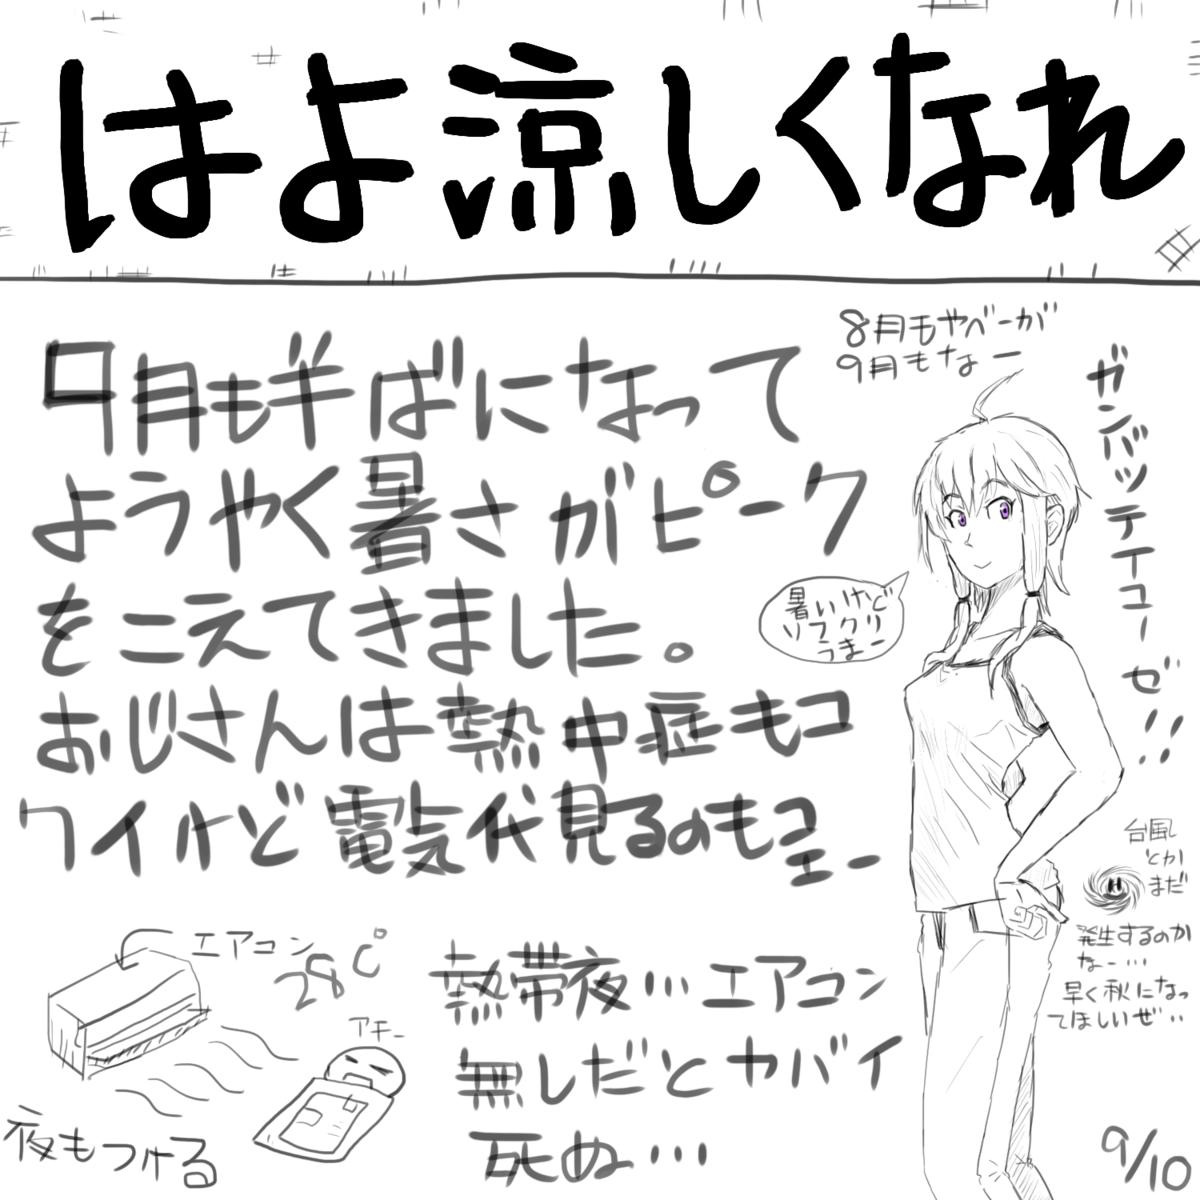 f:id:zomuzomu:20200910093341p:plain